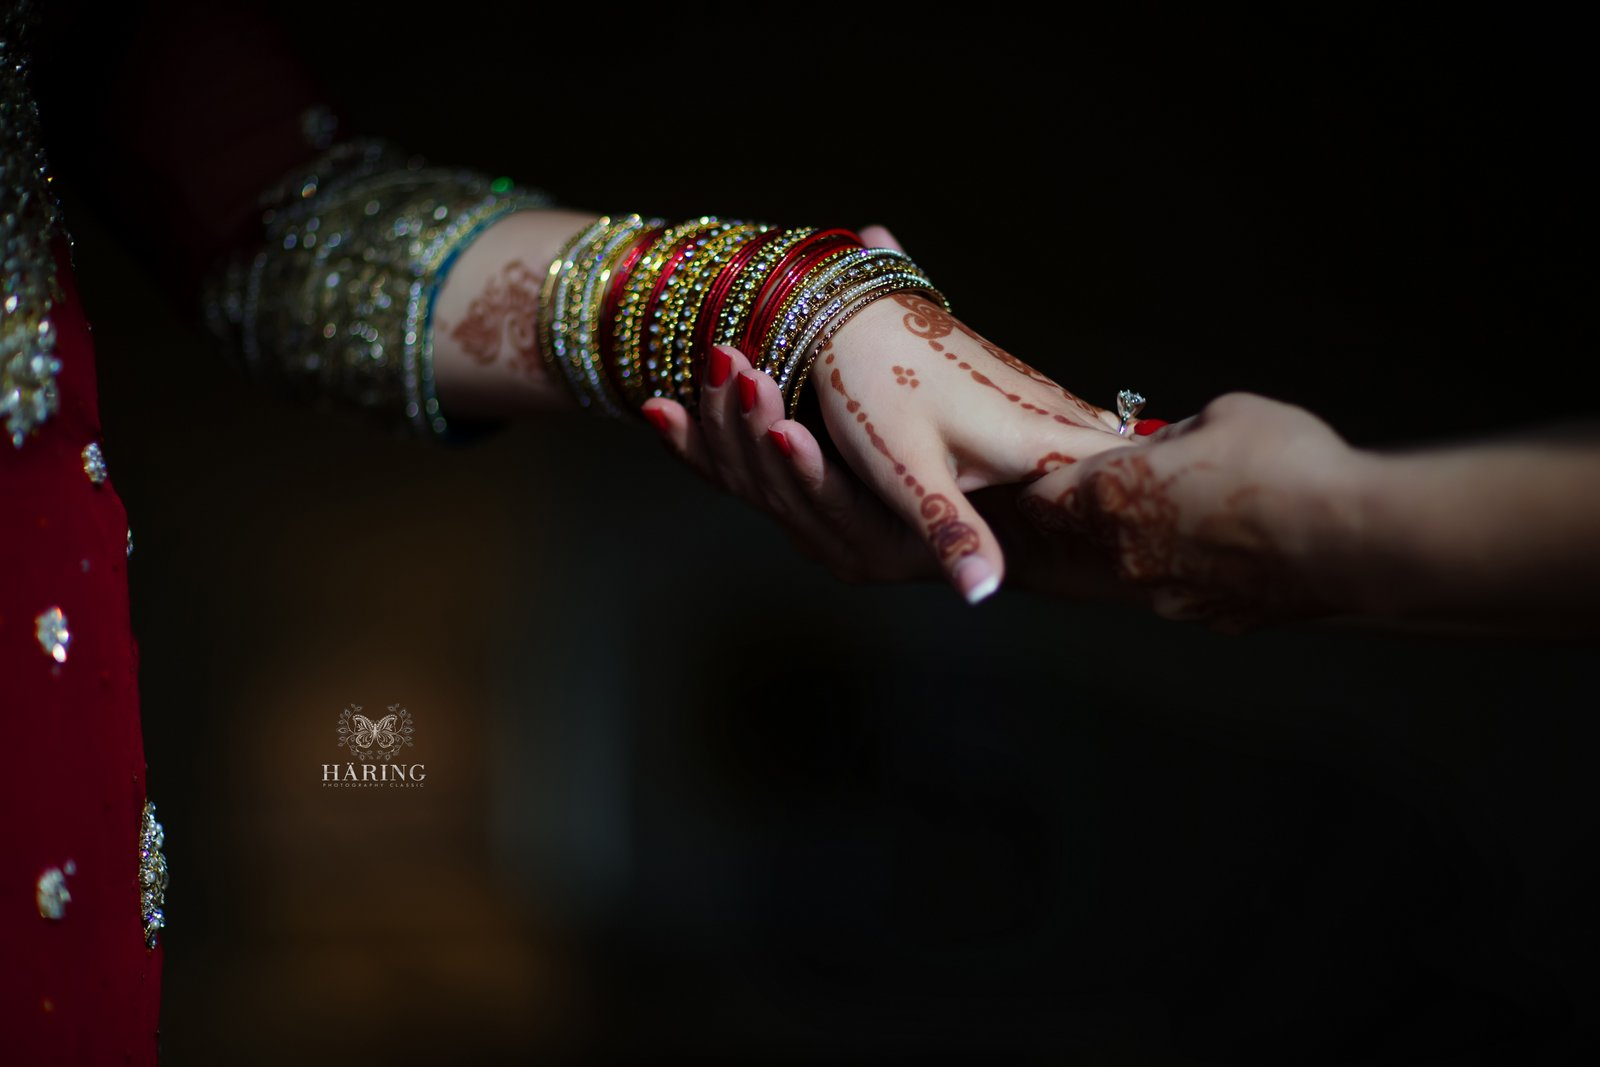 Indian Wedding & Engagement Photography – Traditional Hindu Wedding Ceremony, Miami Wedding Photographers | Häring Photography, Indian Wedding Photographer in Florida, Best Muslim, Hindu - South East Asian Wedding Photographers